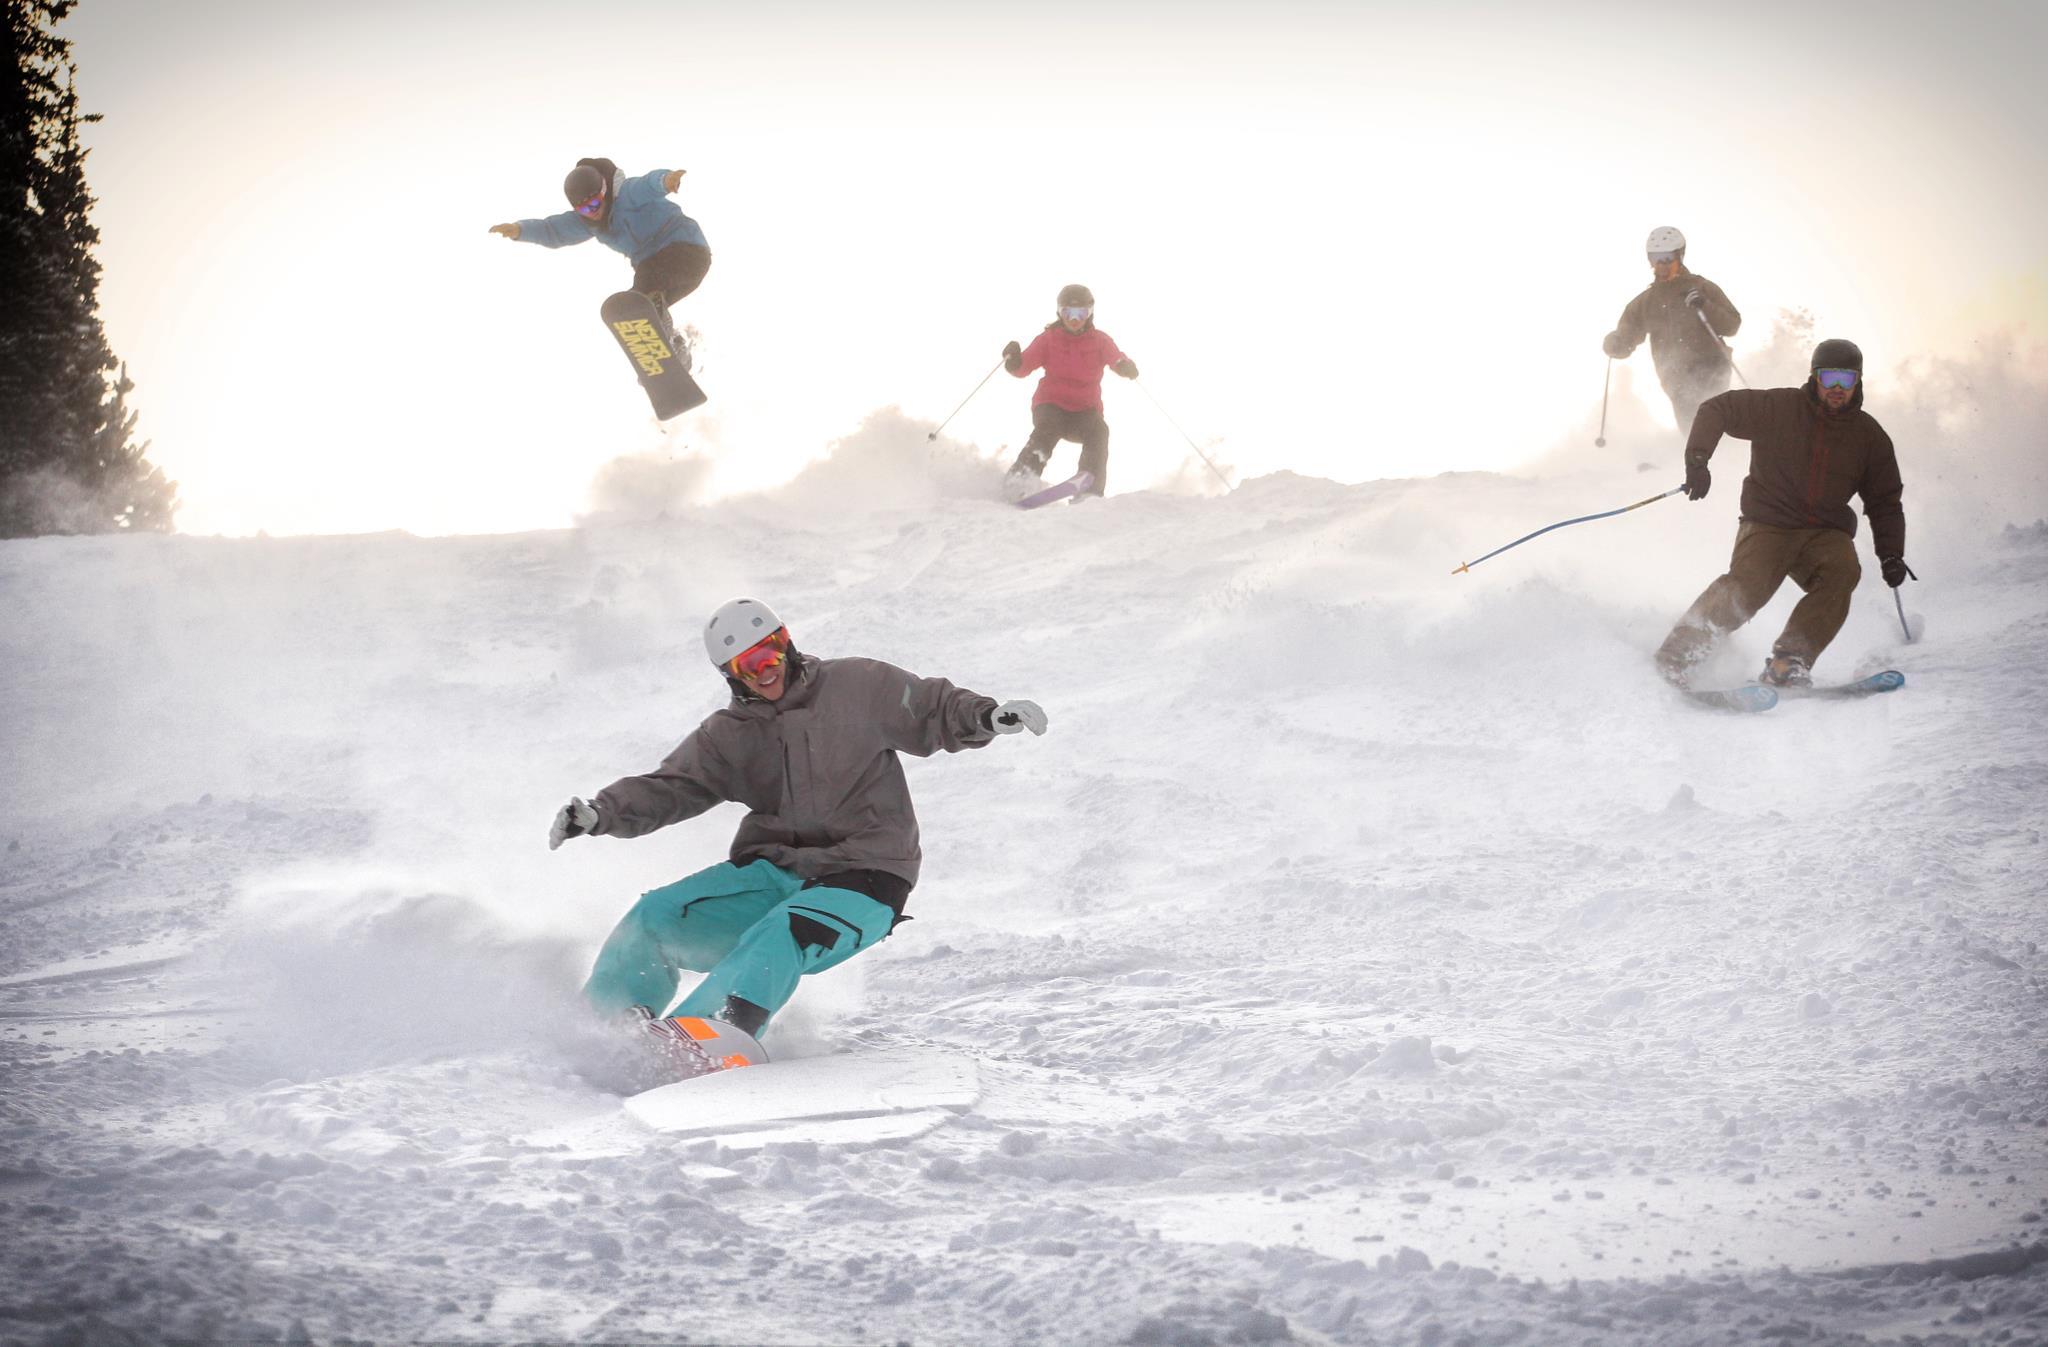 Snowboarders At Copper Mountain Credit Tripp Fay Copper